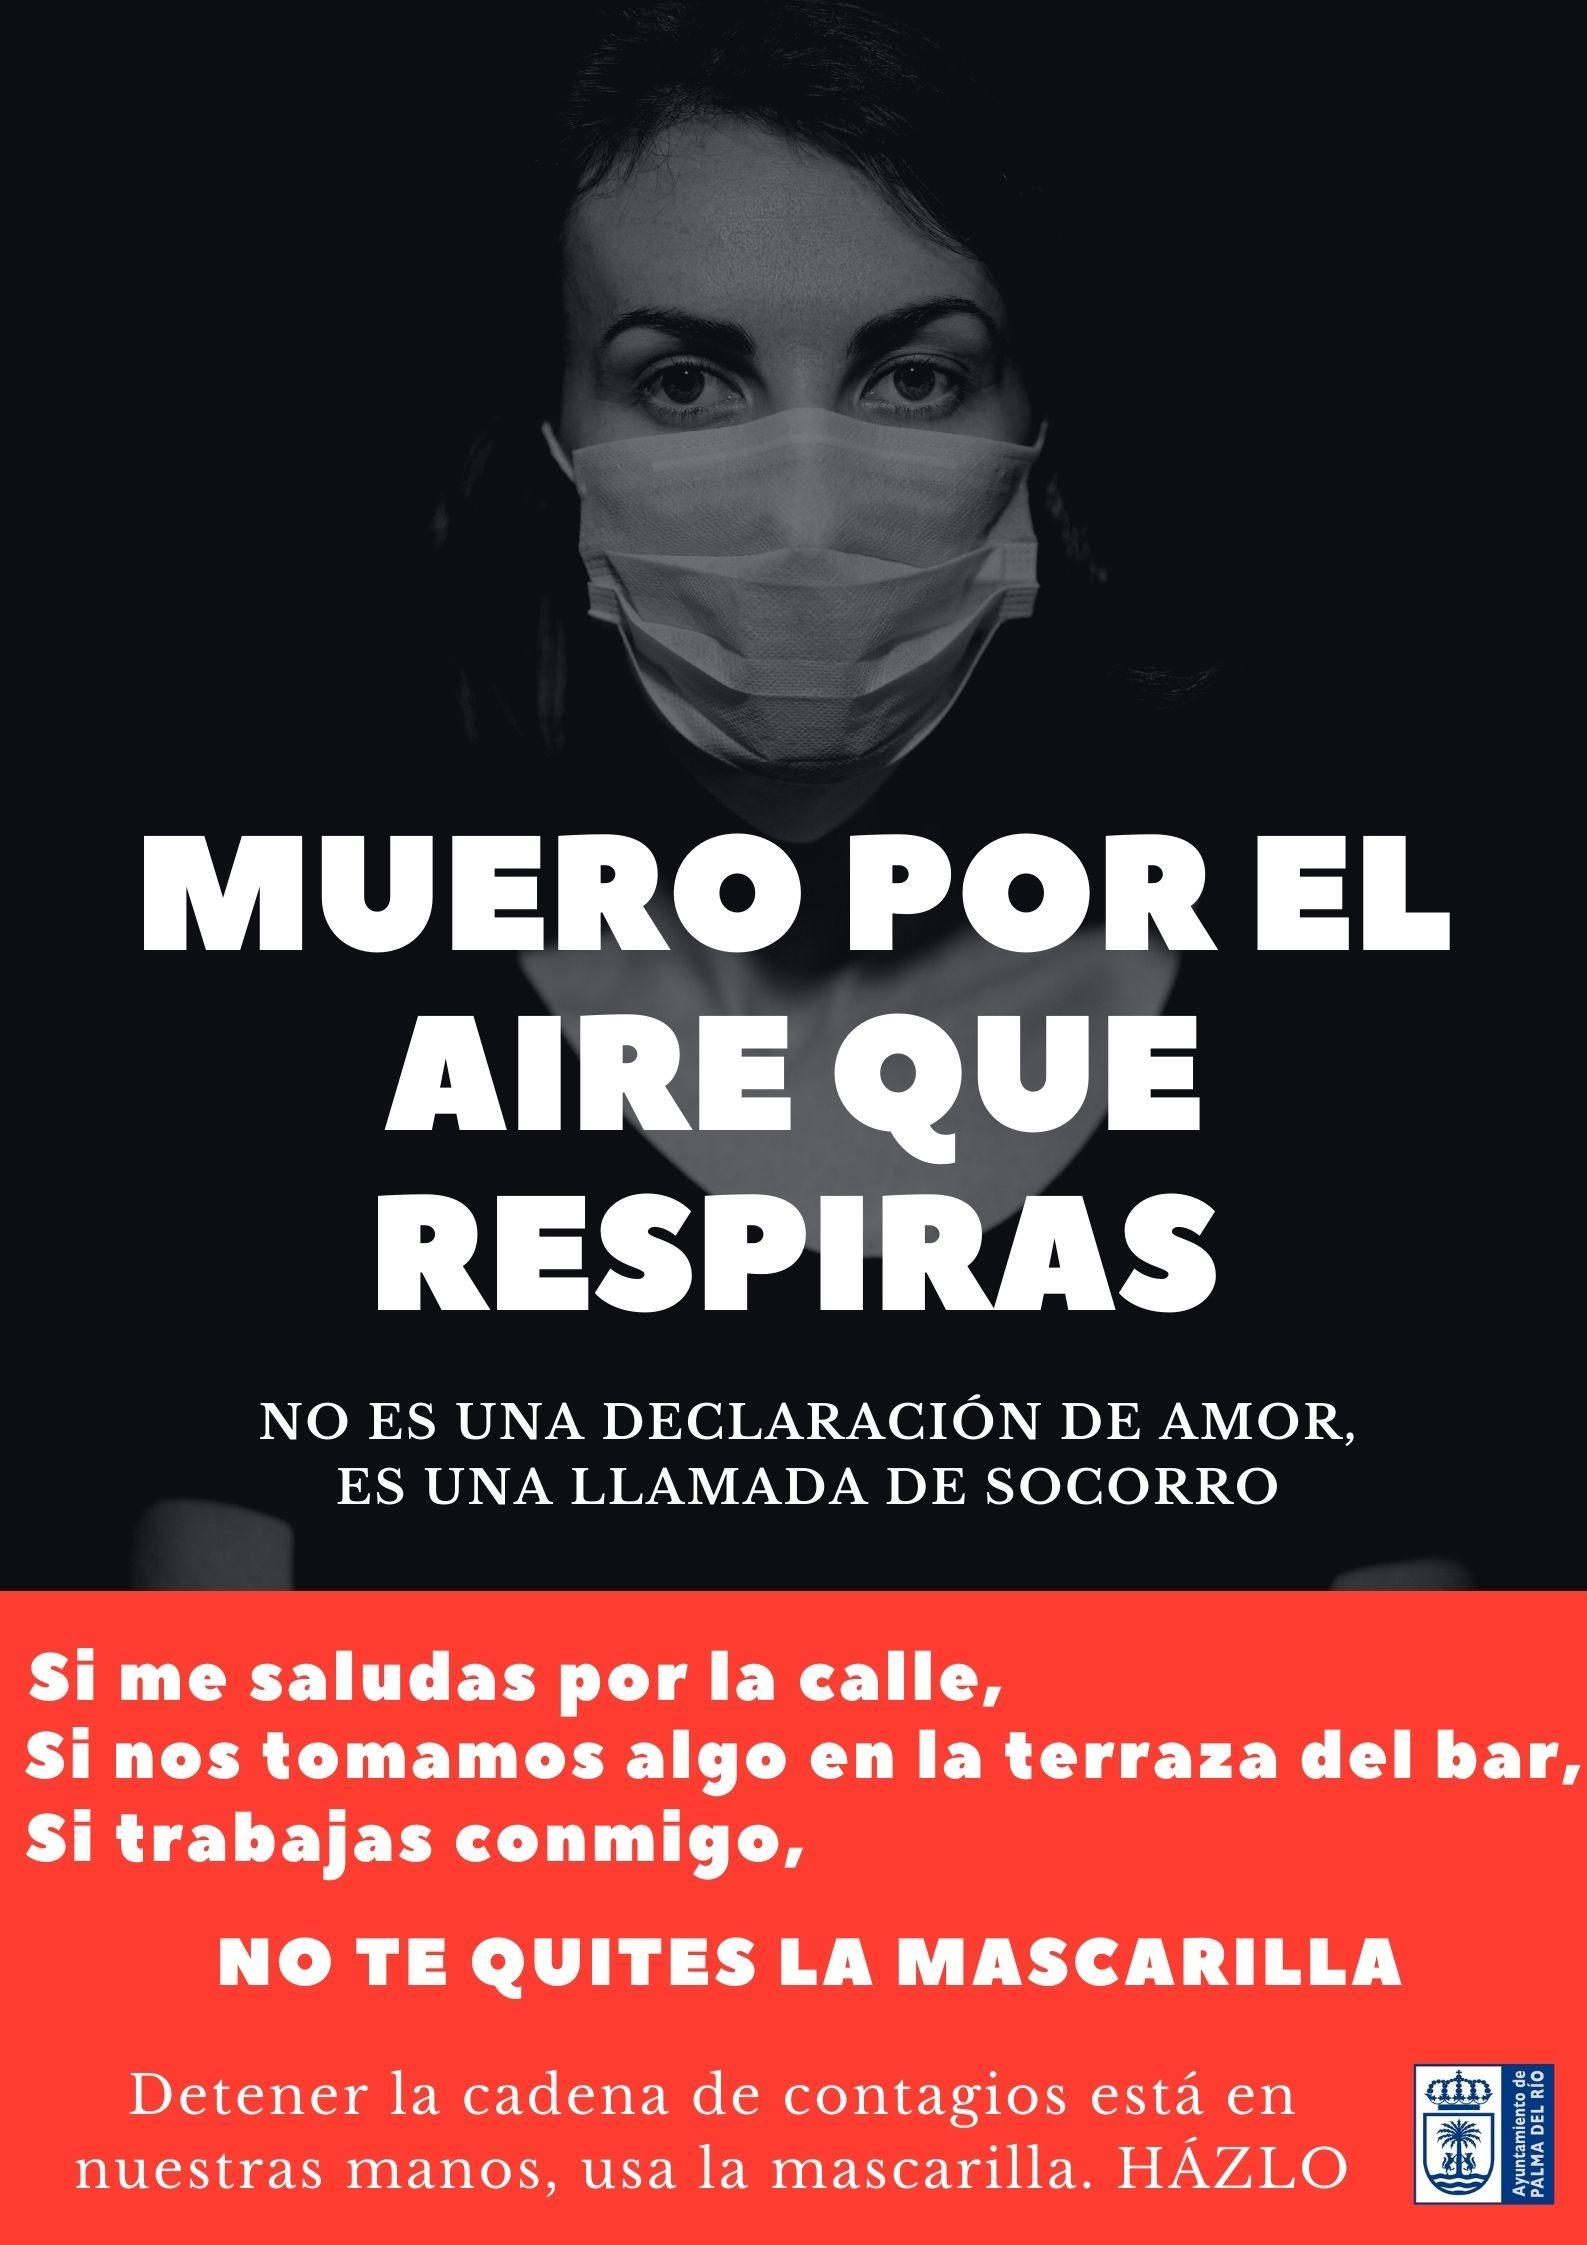 https://www.palmadelrio.es/sites/default/files/uso_mascarilla_0.jpg